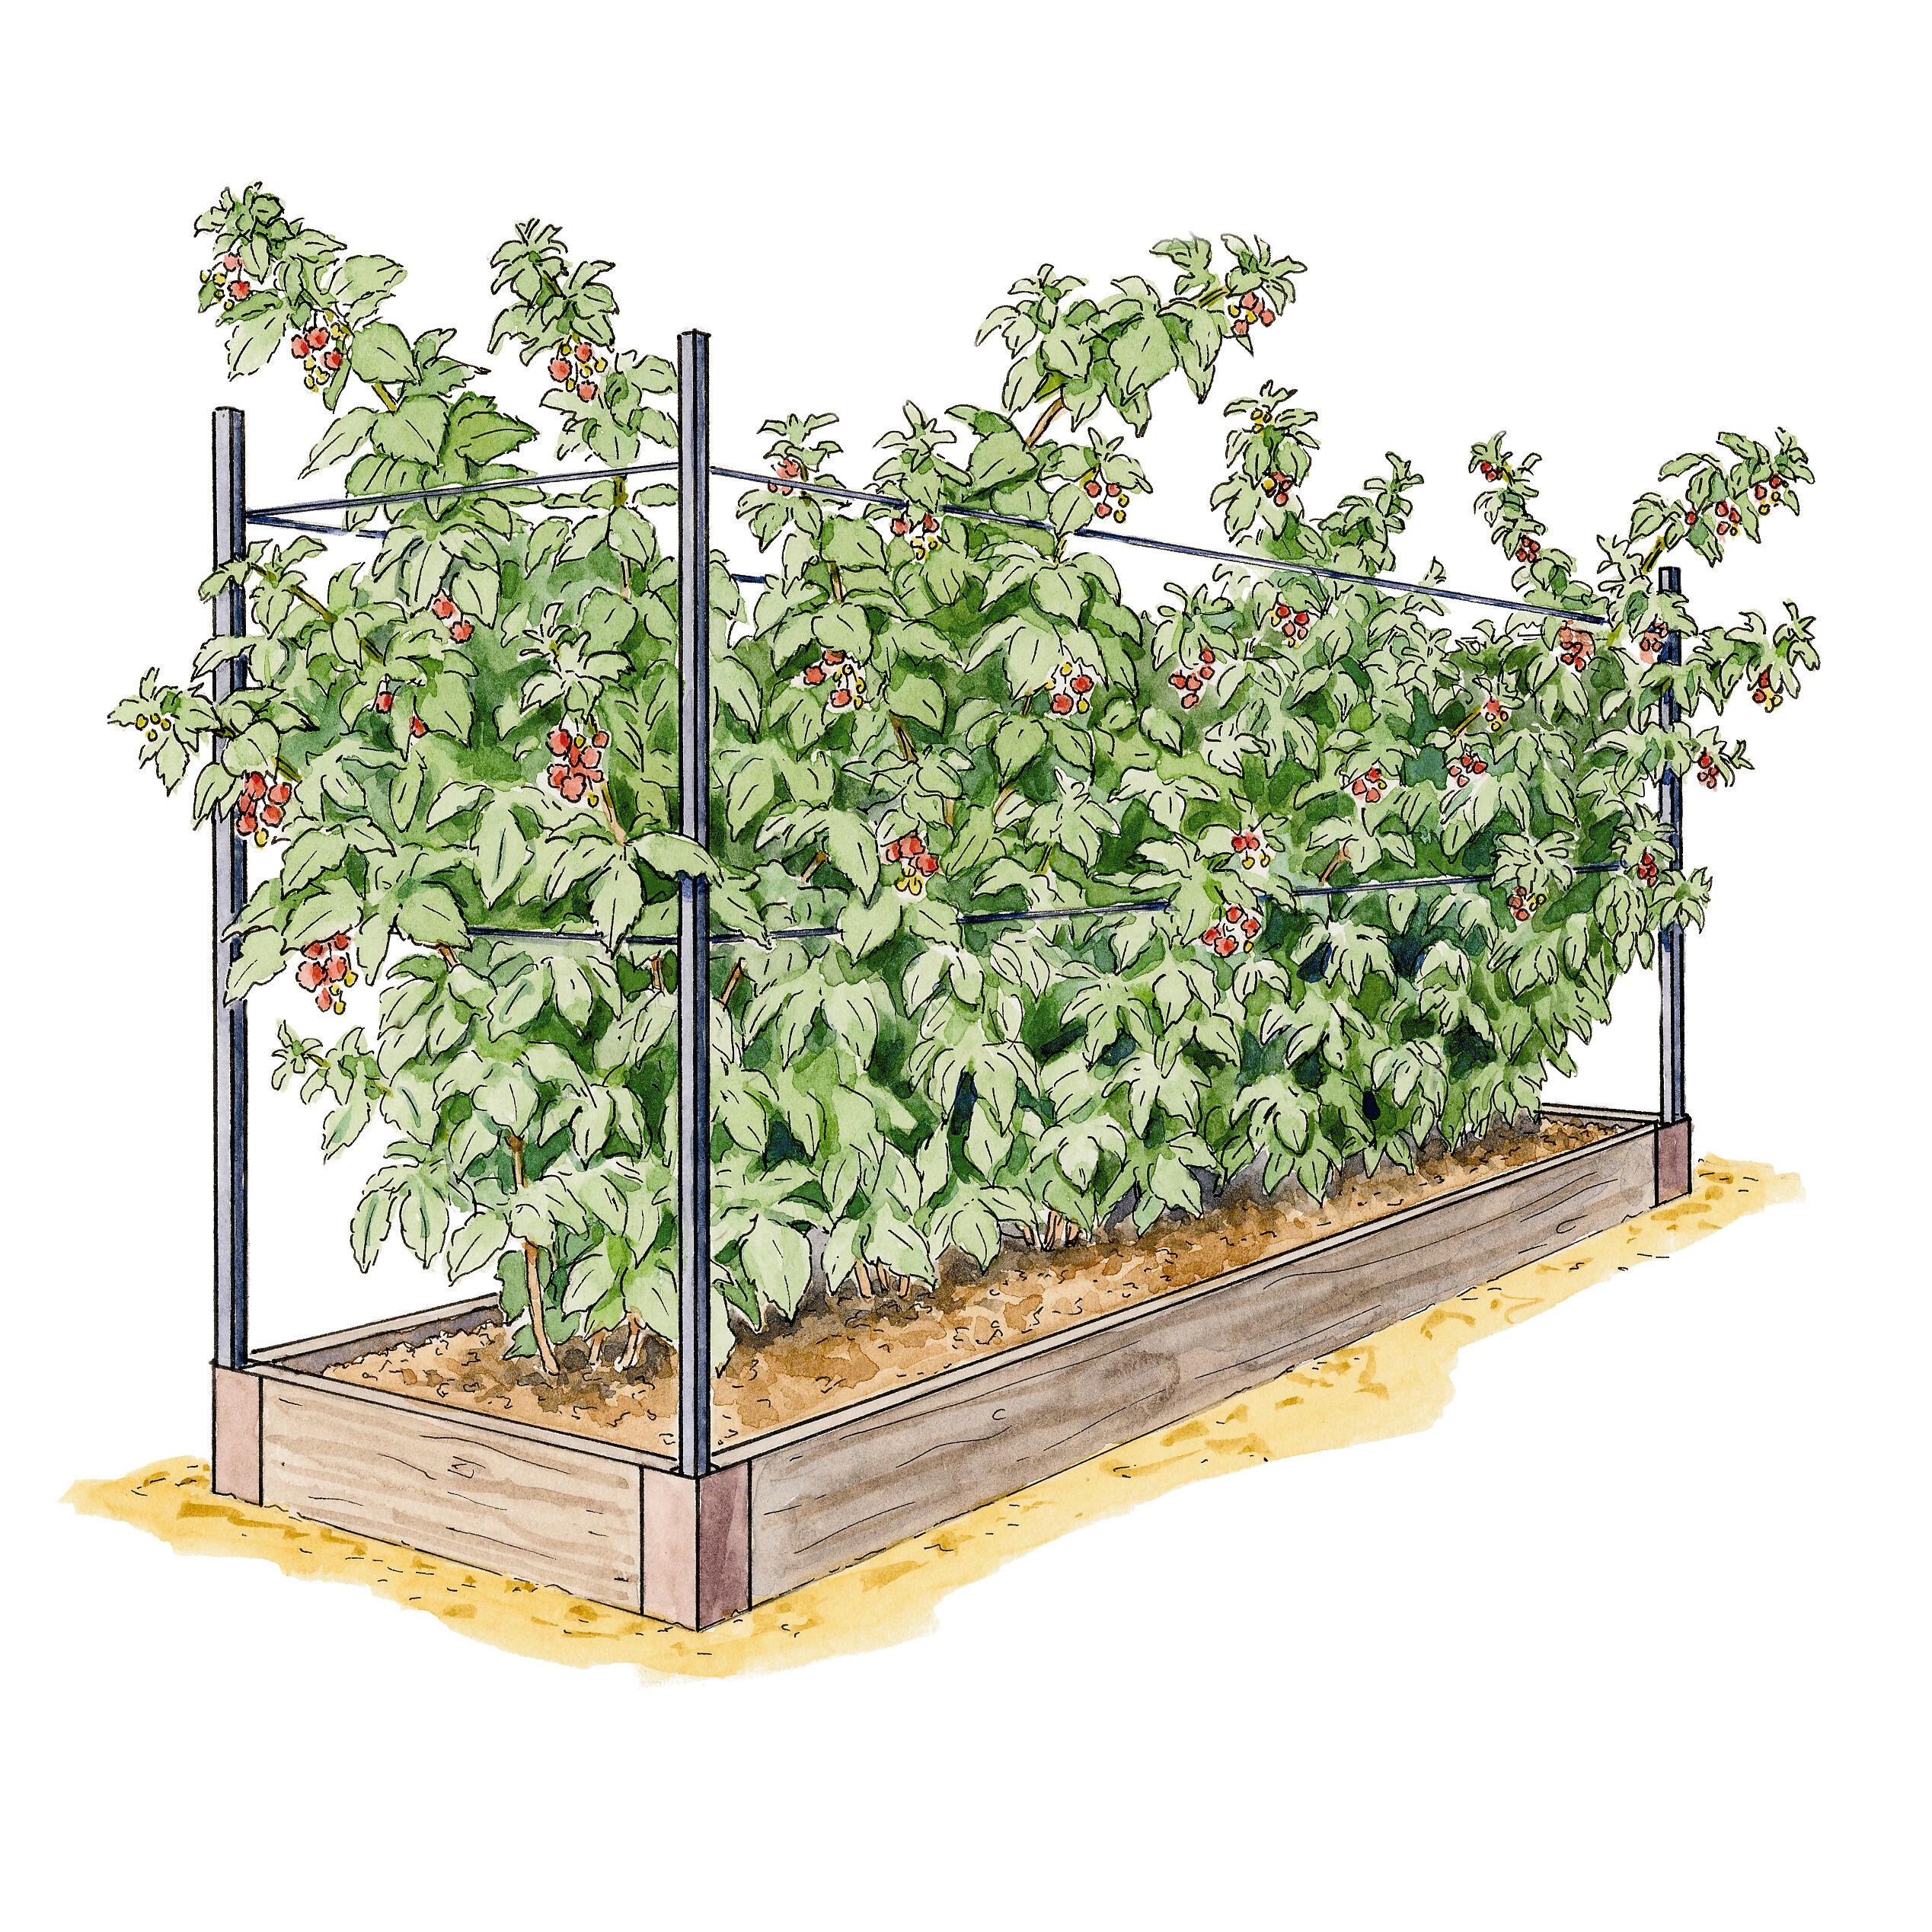 How Grow Asparagus In A Raised Bed